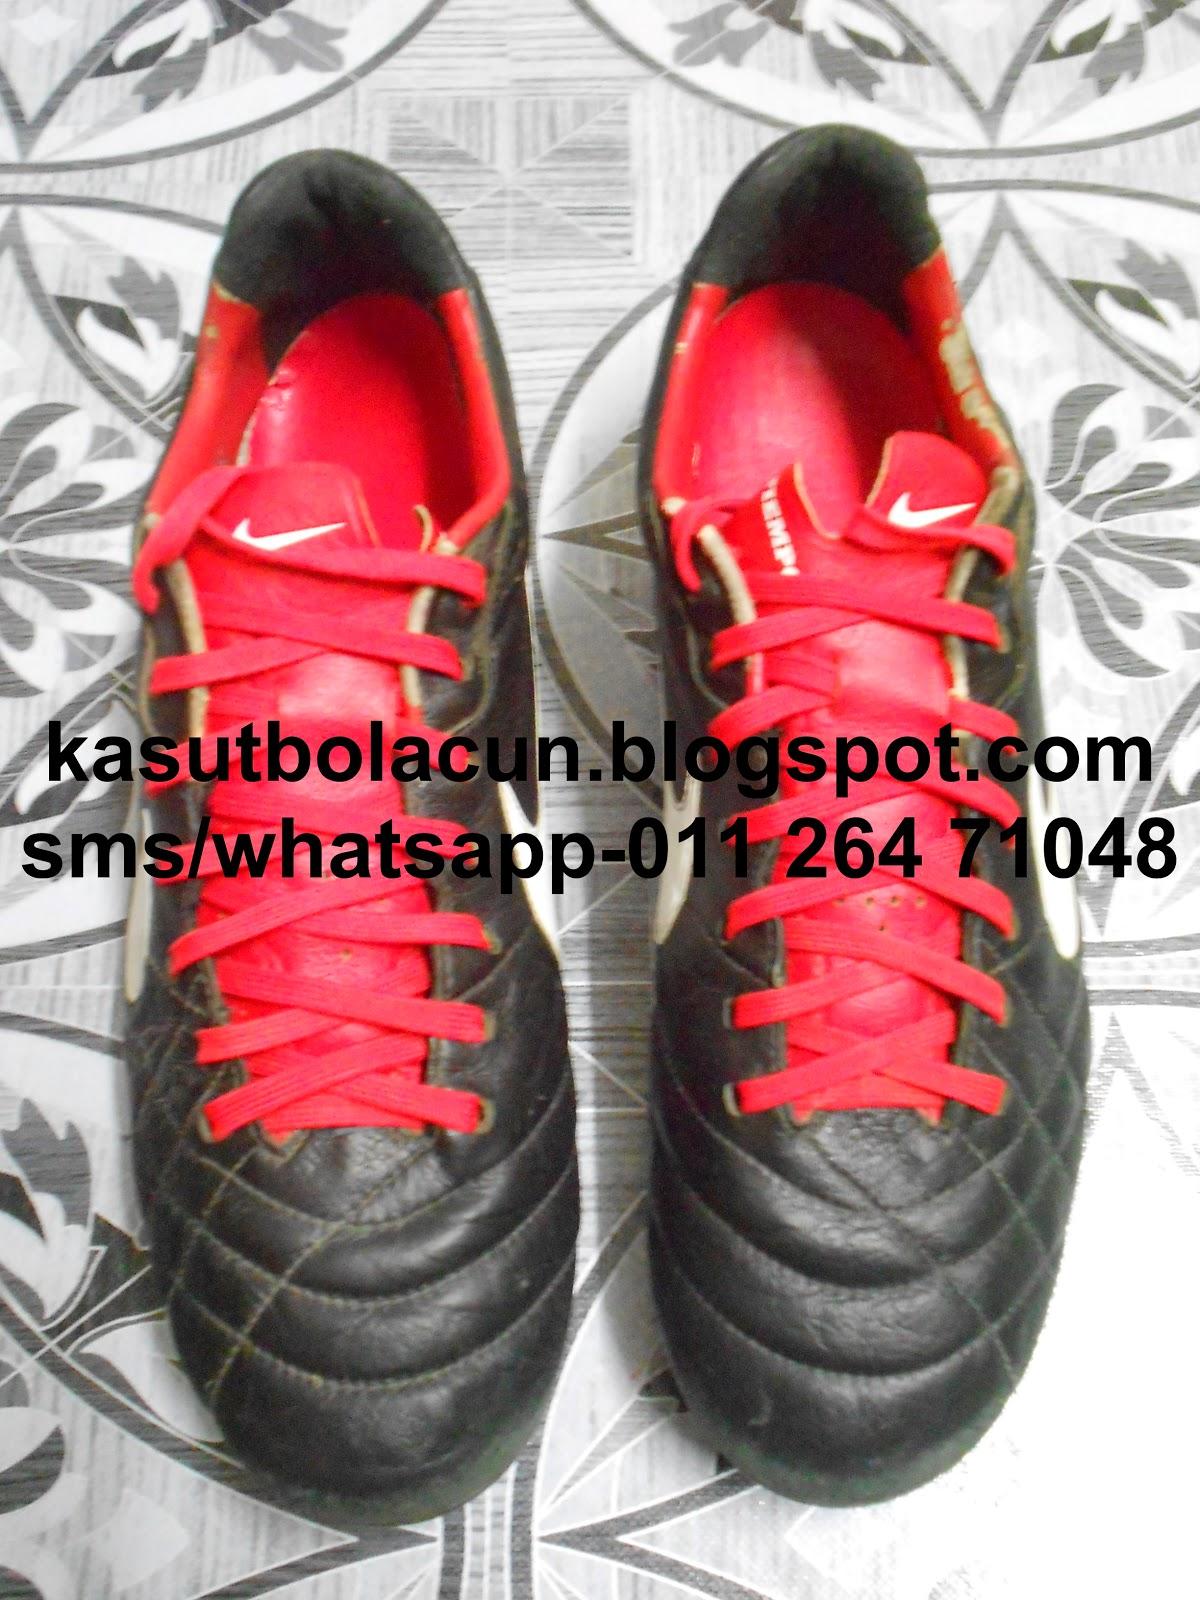 http://kasutbolacun.blogspot.com/2015/04/nike-tiempo-legend-4-sgpro_15.html